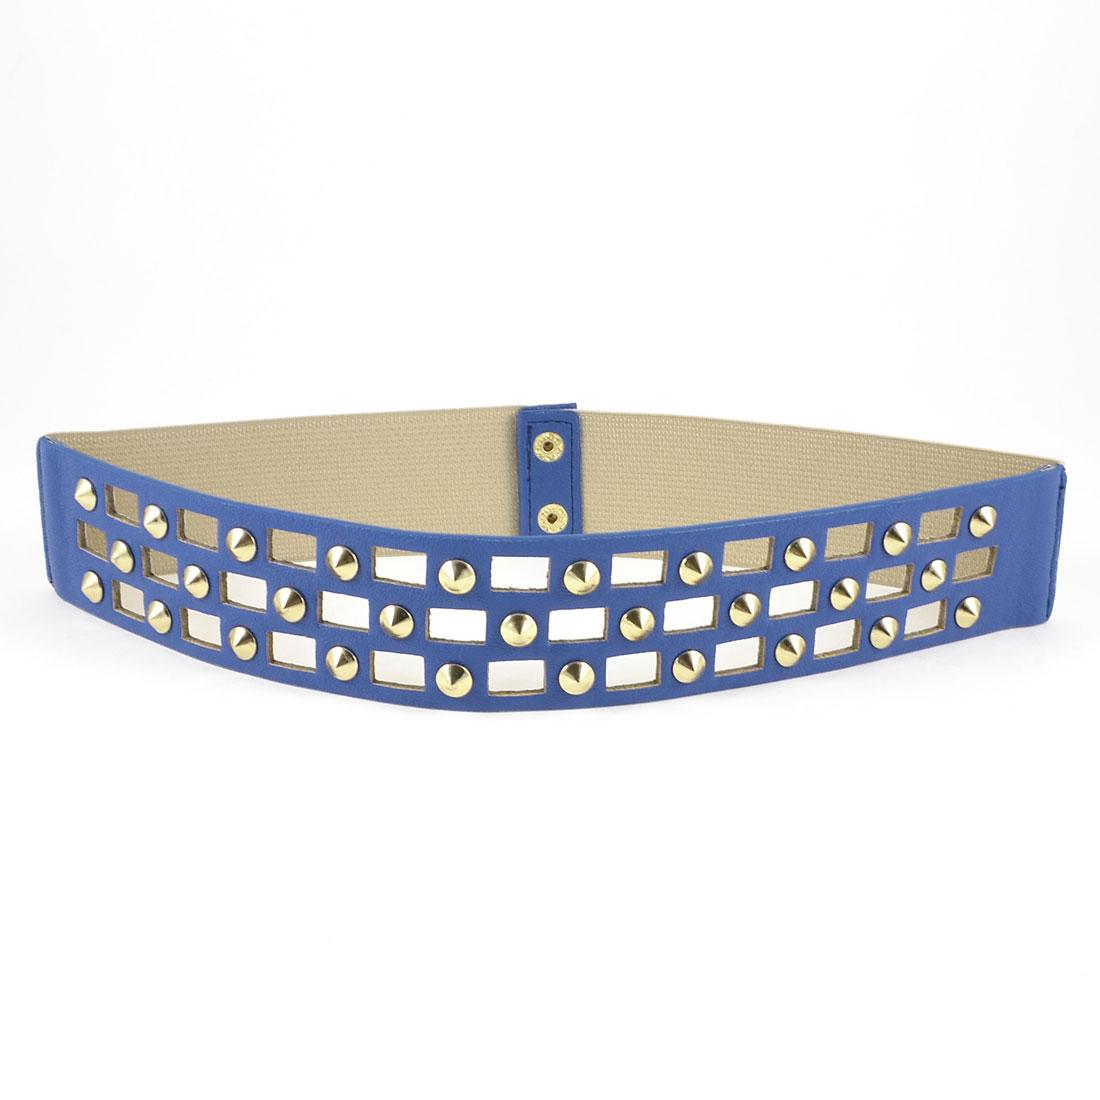 Woman Metal Buckle Crocodile Print Nail Detailing Stretchy Cinch Waist Belt Blue